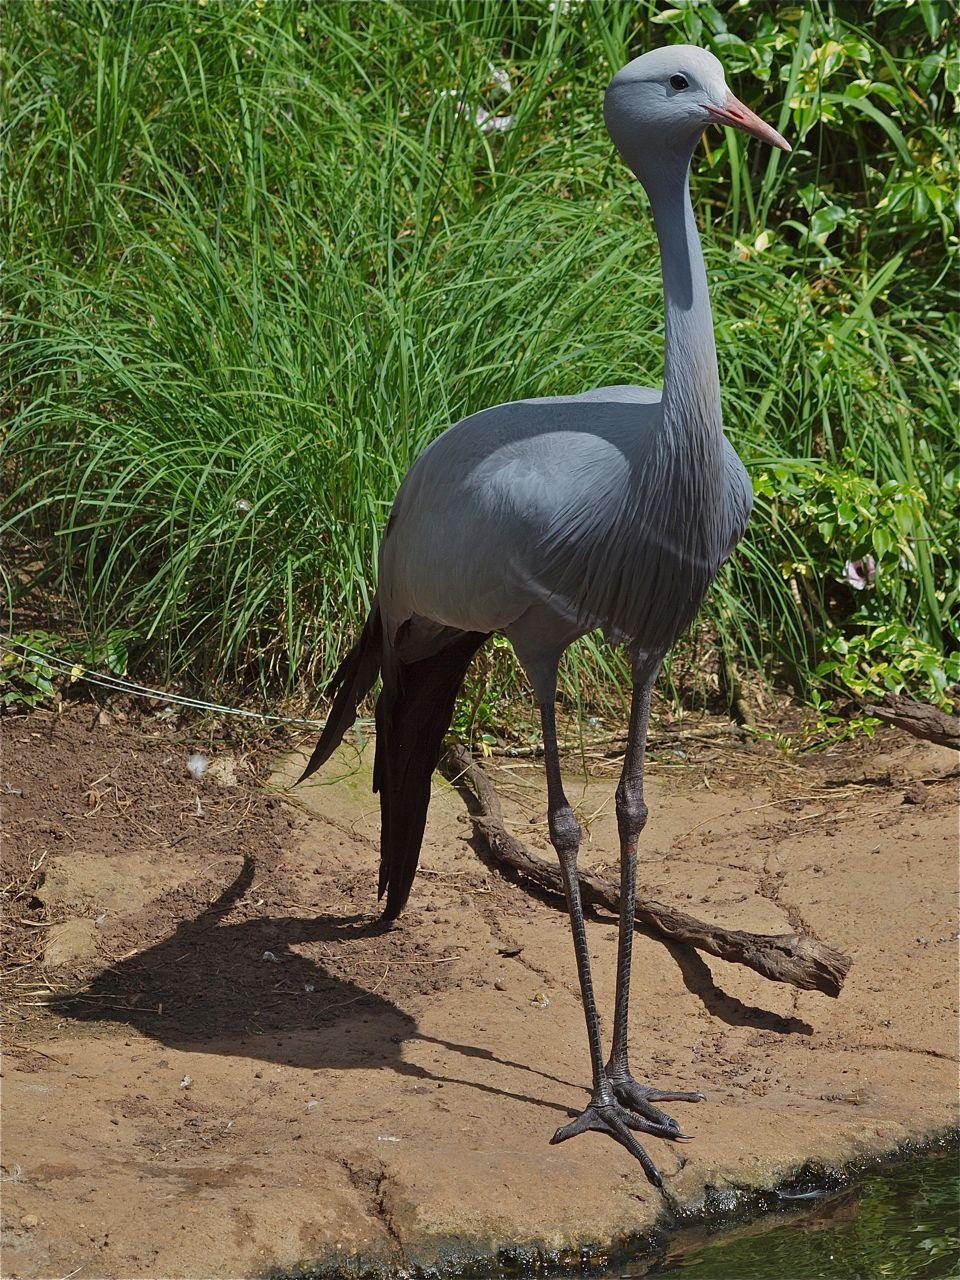 Birds of Eden, Plettenberg Bay © greyworldnomads